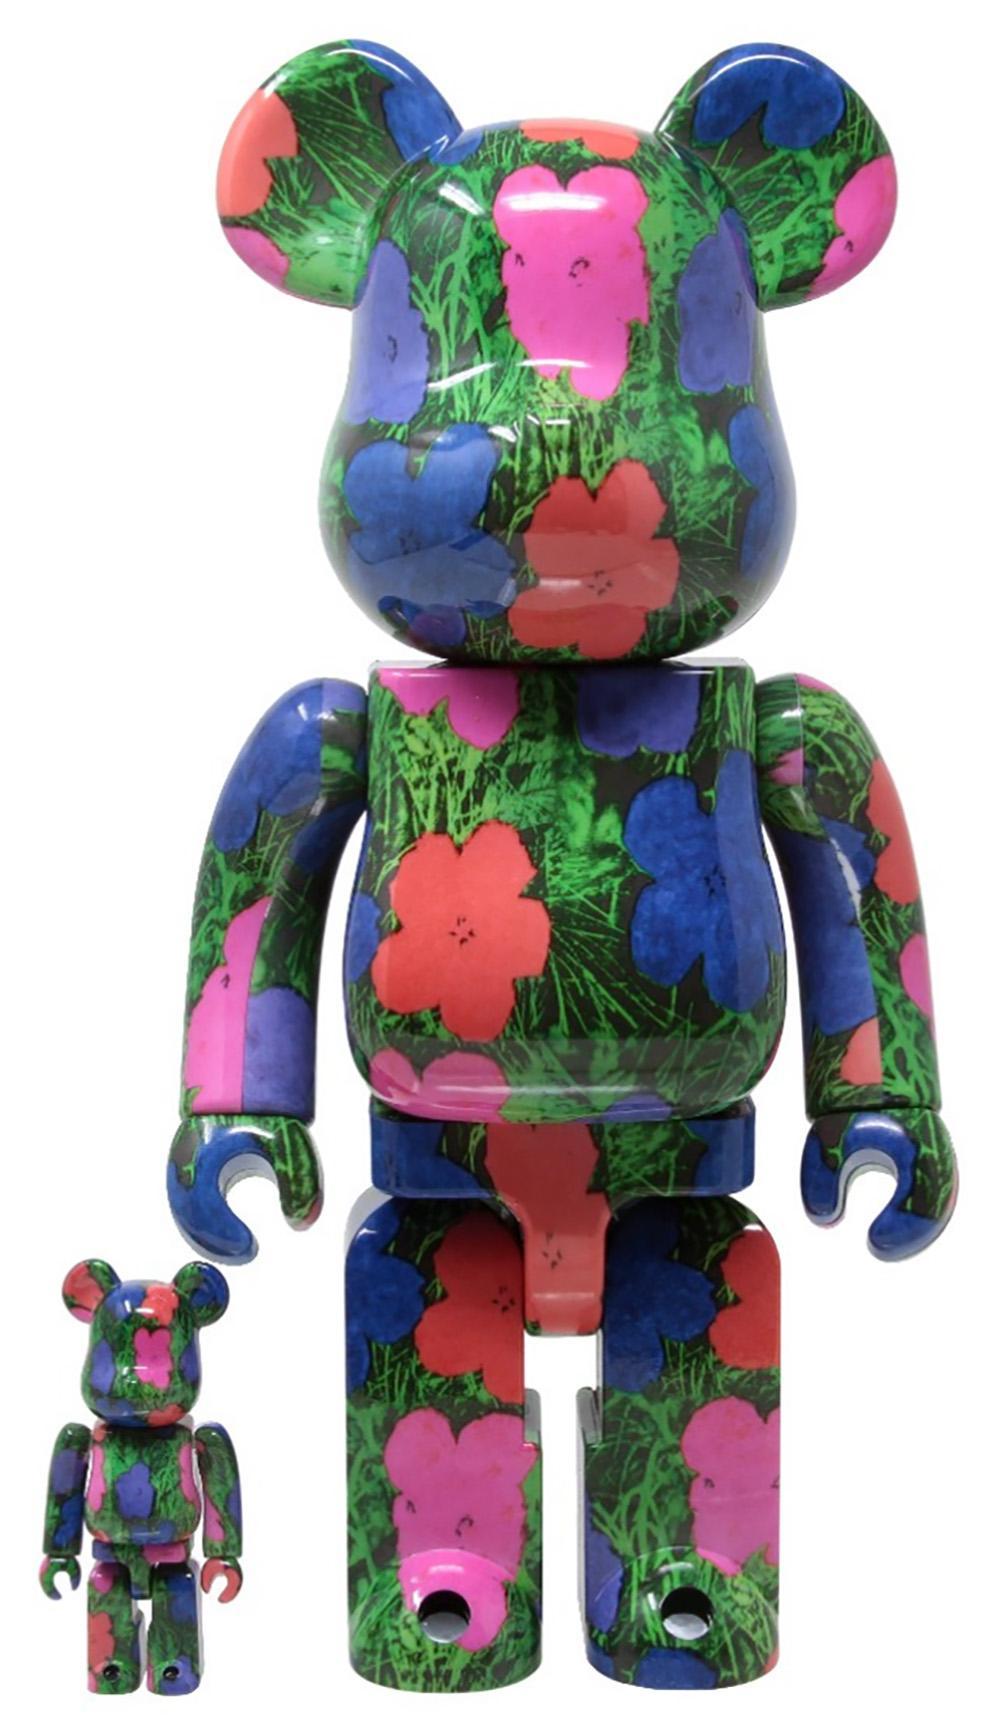 Andy Warhol Flowers Bearbrick 400% Companion (Warhol BE@RBRICK 400%)